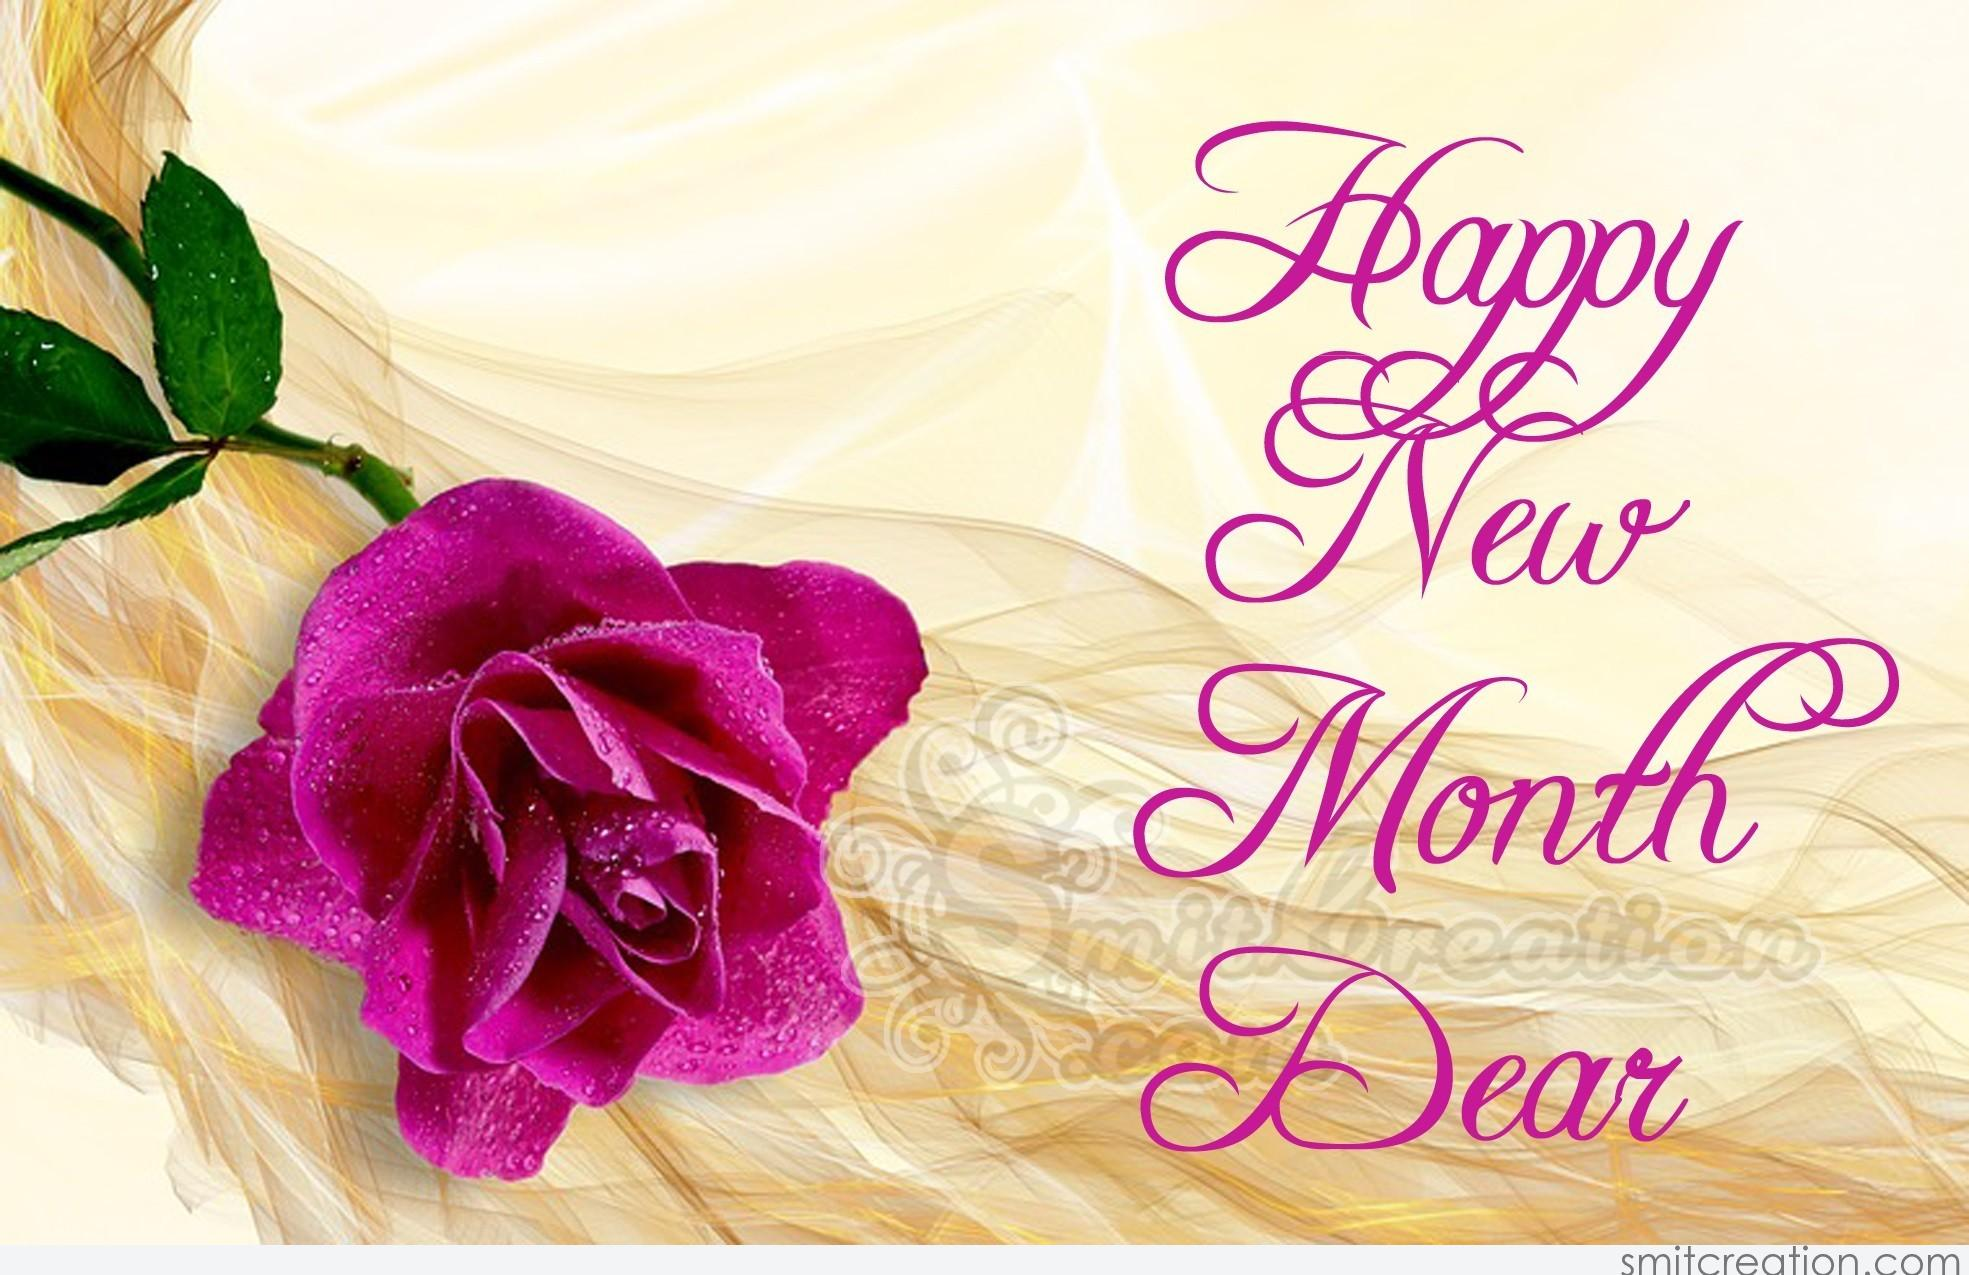 Happy New Month Dear - SmitCreation.com